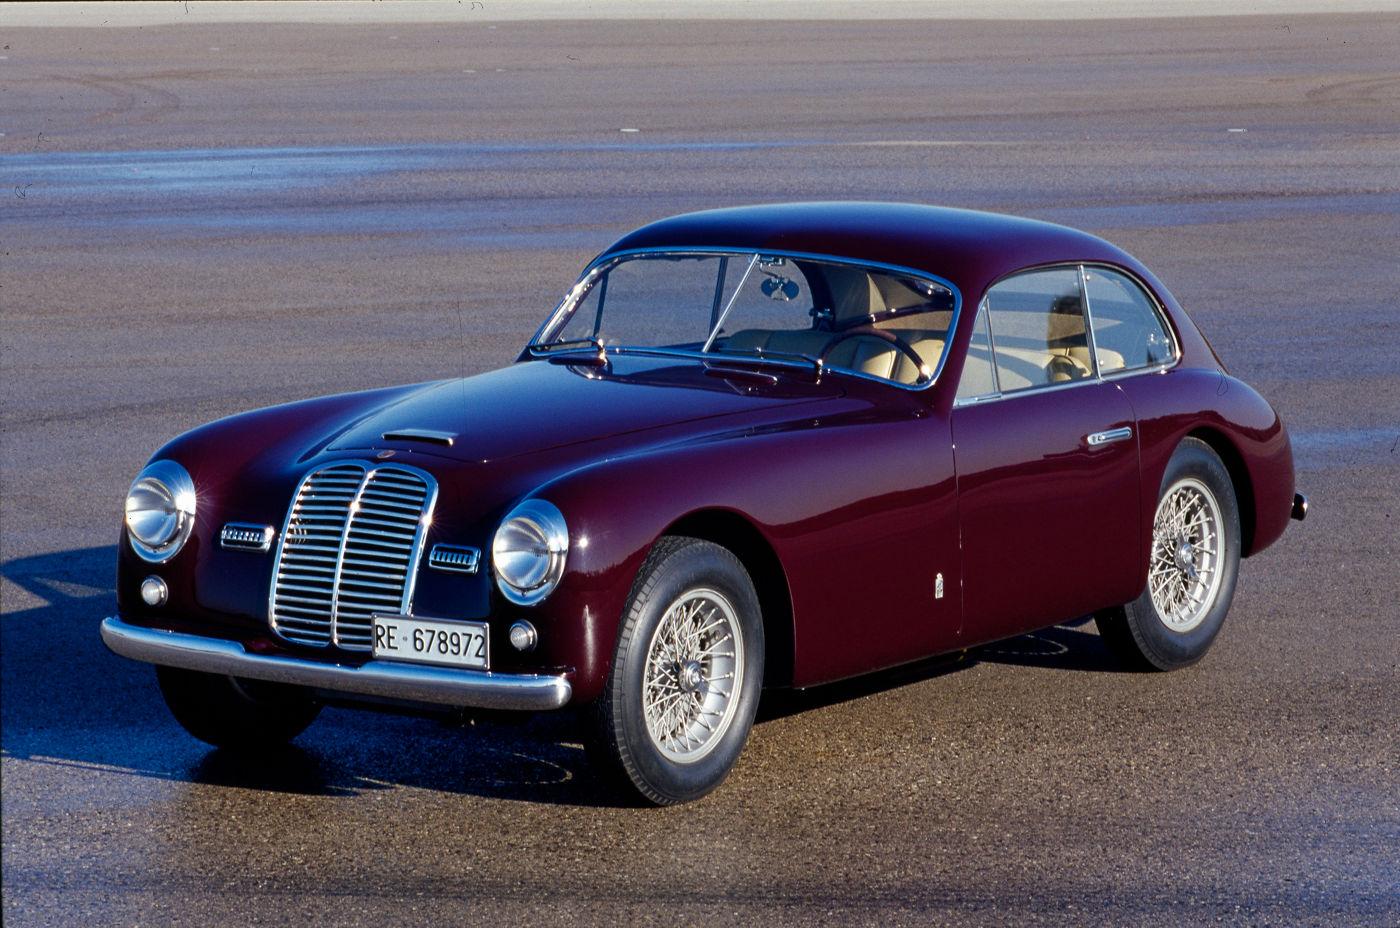 1947 Maserati A6 1500 Gran Turismo - A 2-seater coupe by Pininfarina